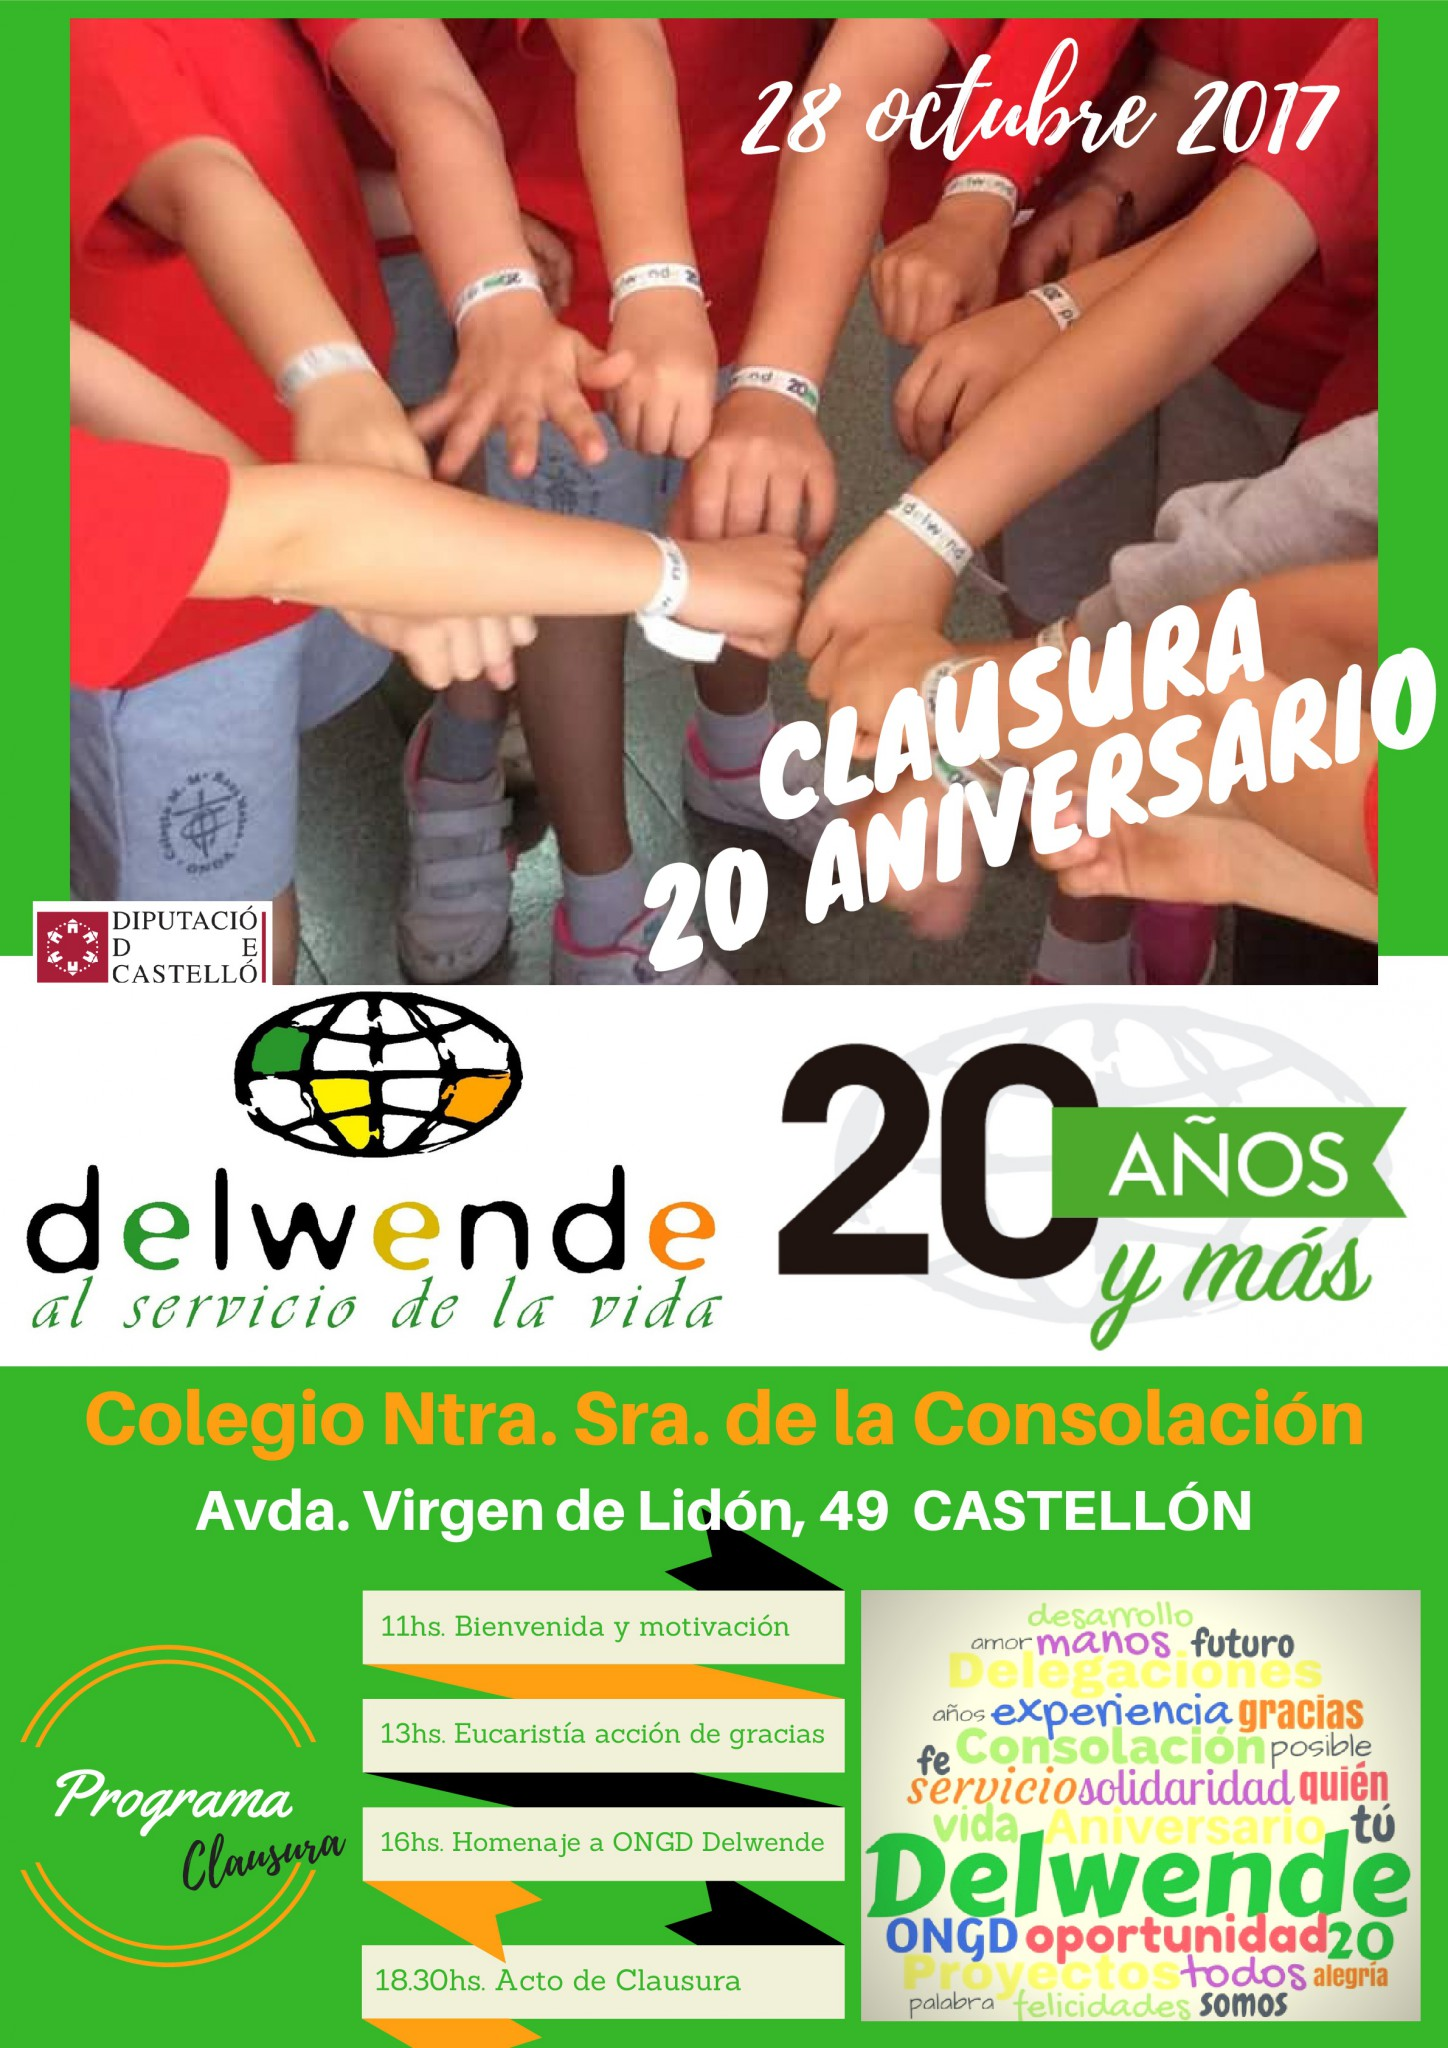 CARTEL CLAUSURA 20 ANIVERSARIO-001